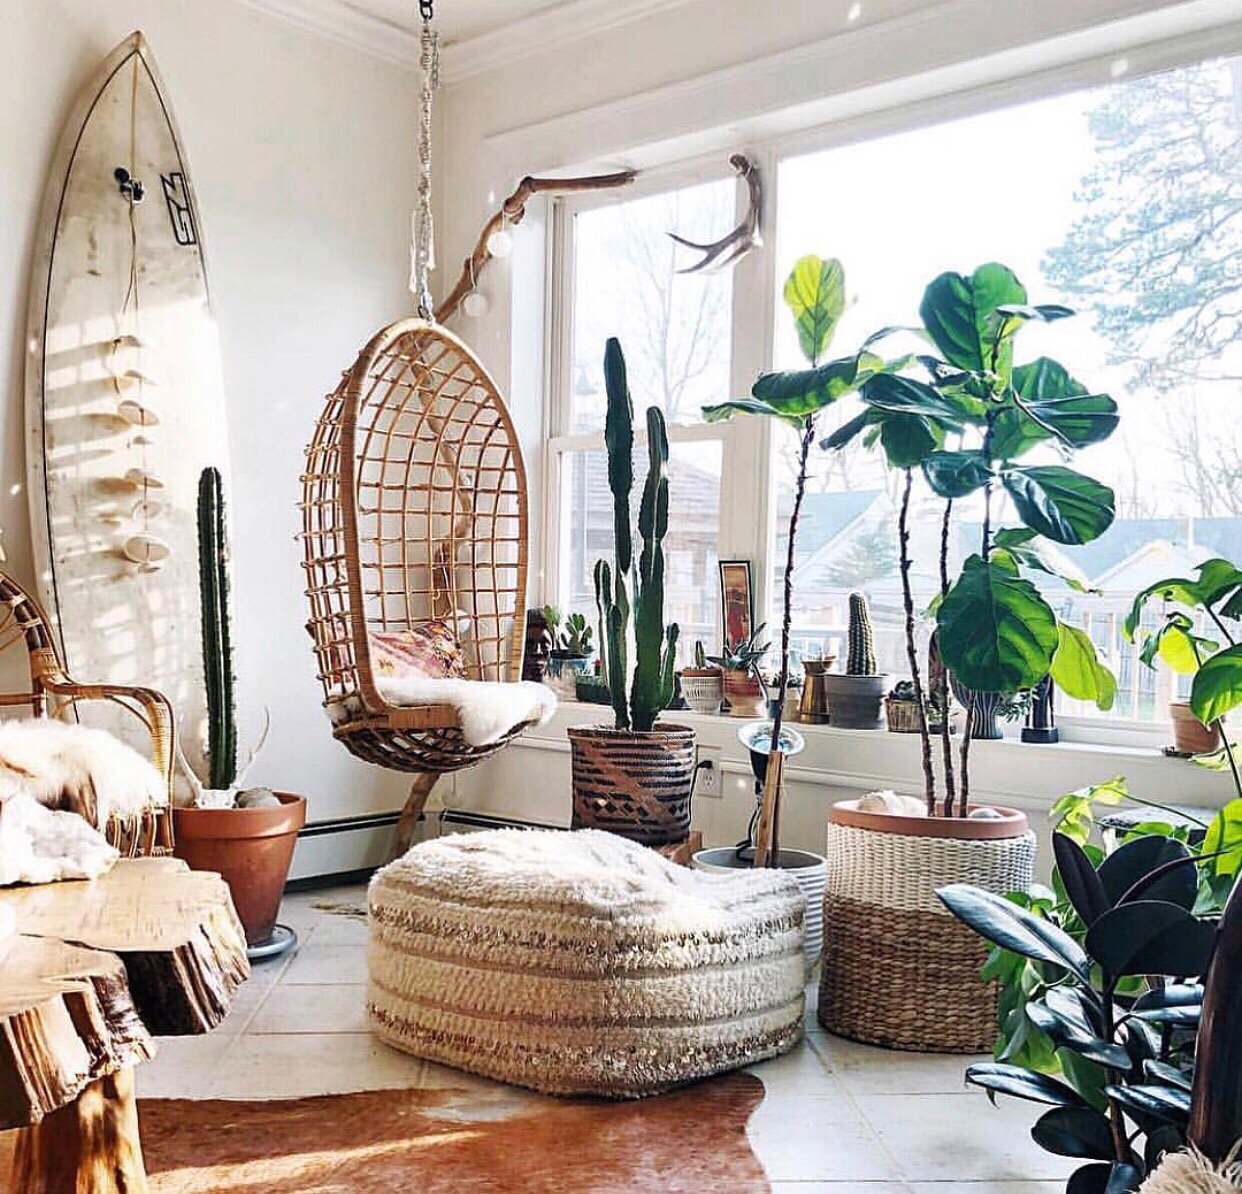 Güneşli,güzel bir güne günaydın☀️ 📷 : @sara__pavao #marieclairemaisontr #decoideas #decoration #inspiration #morning https://t.co/7ajslKJBBg